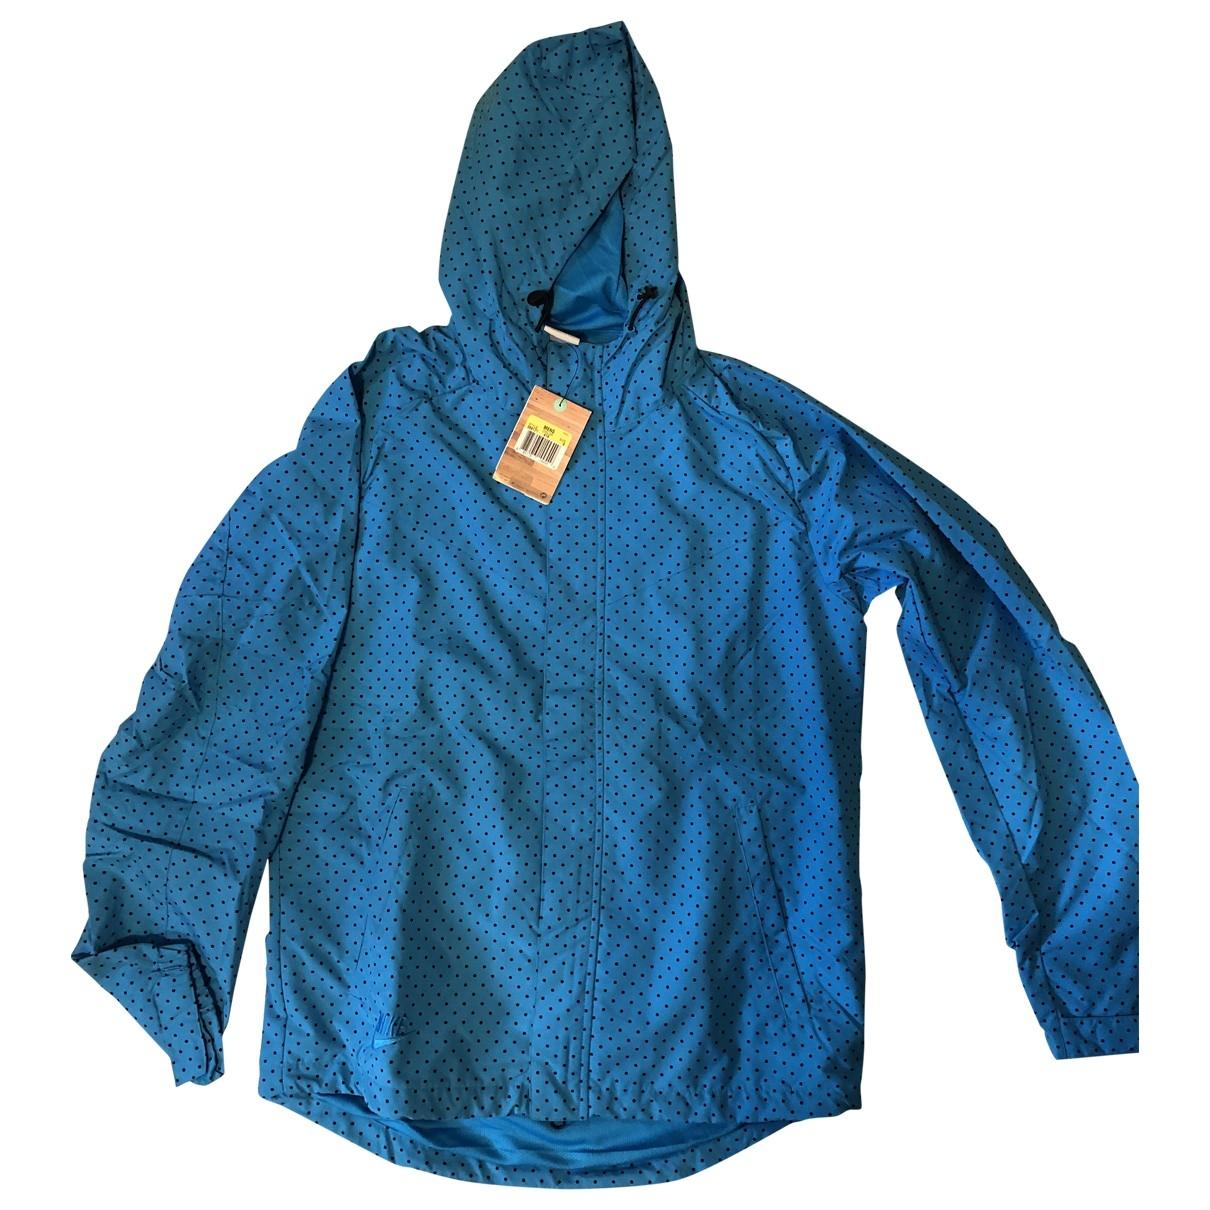 Nike \N Blue jacket  for Men S International